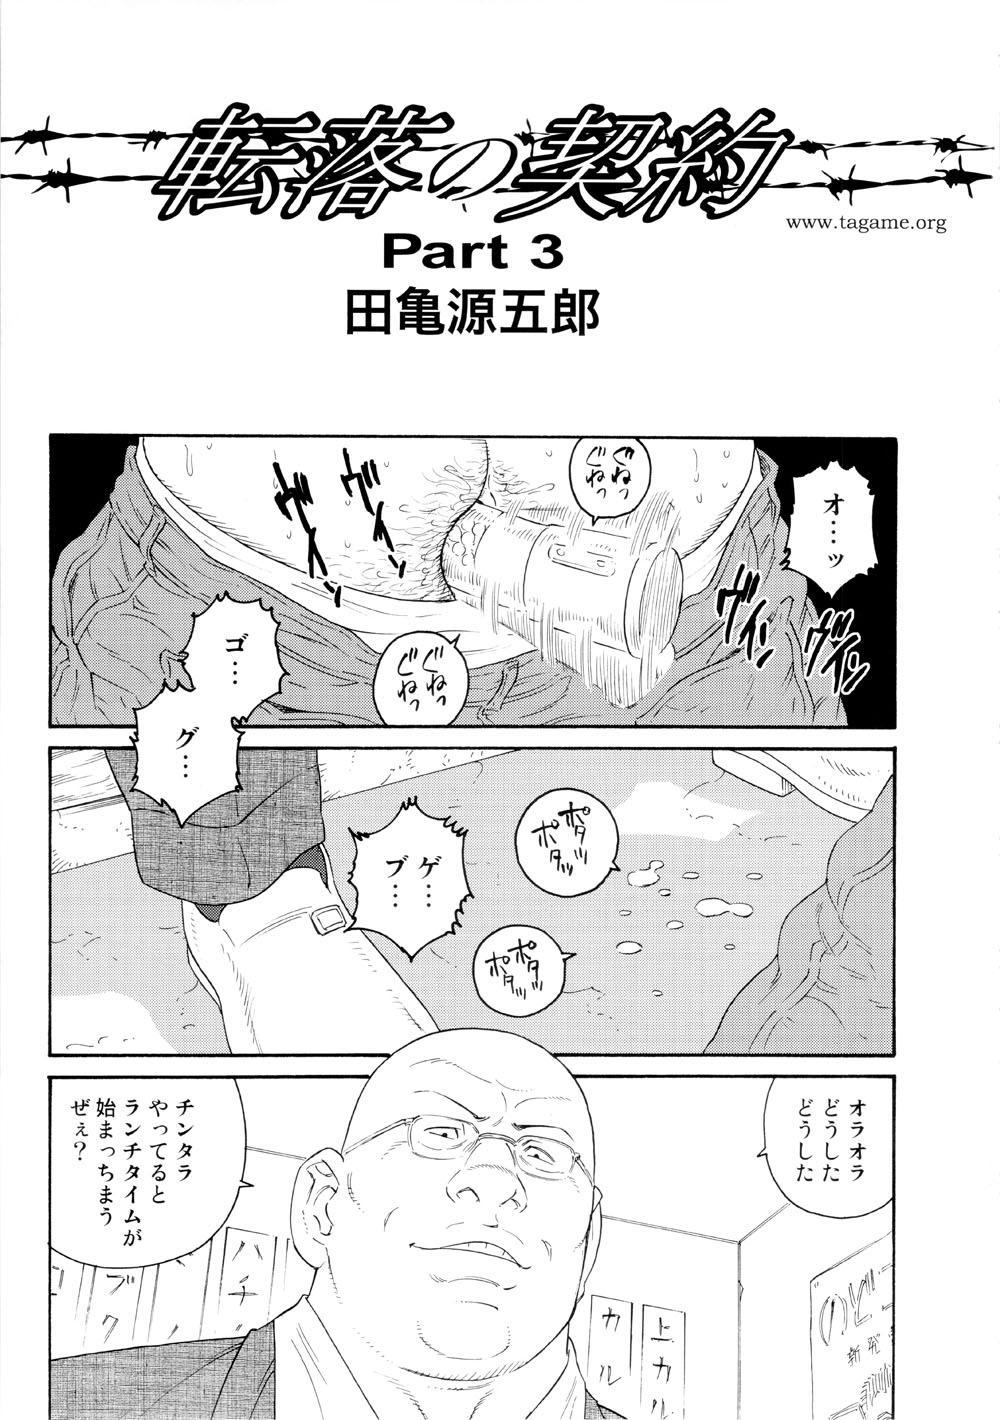 Genryu Chapter 3 0